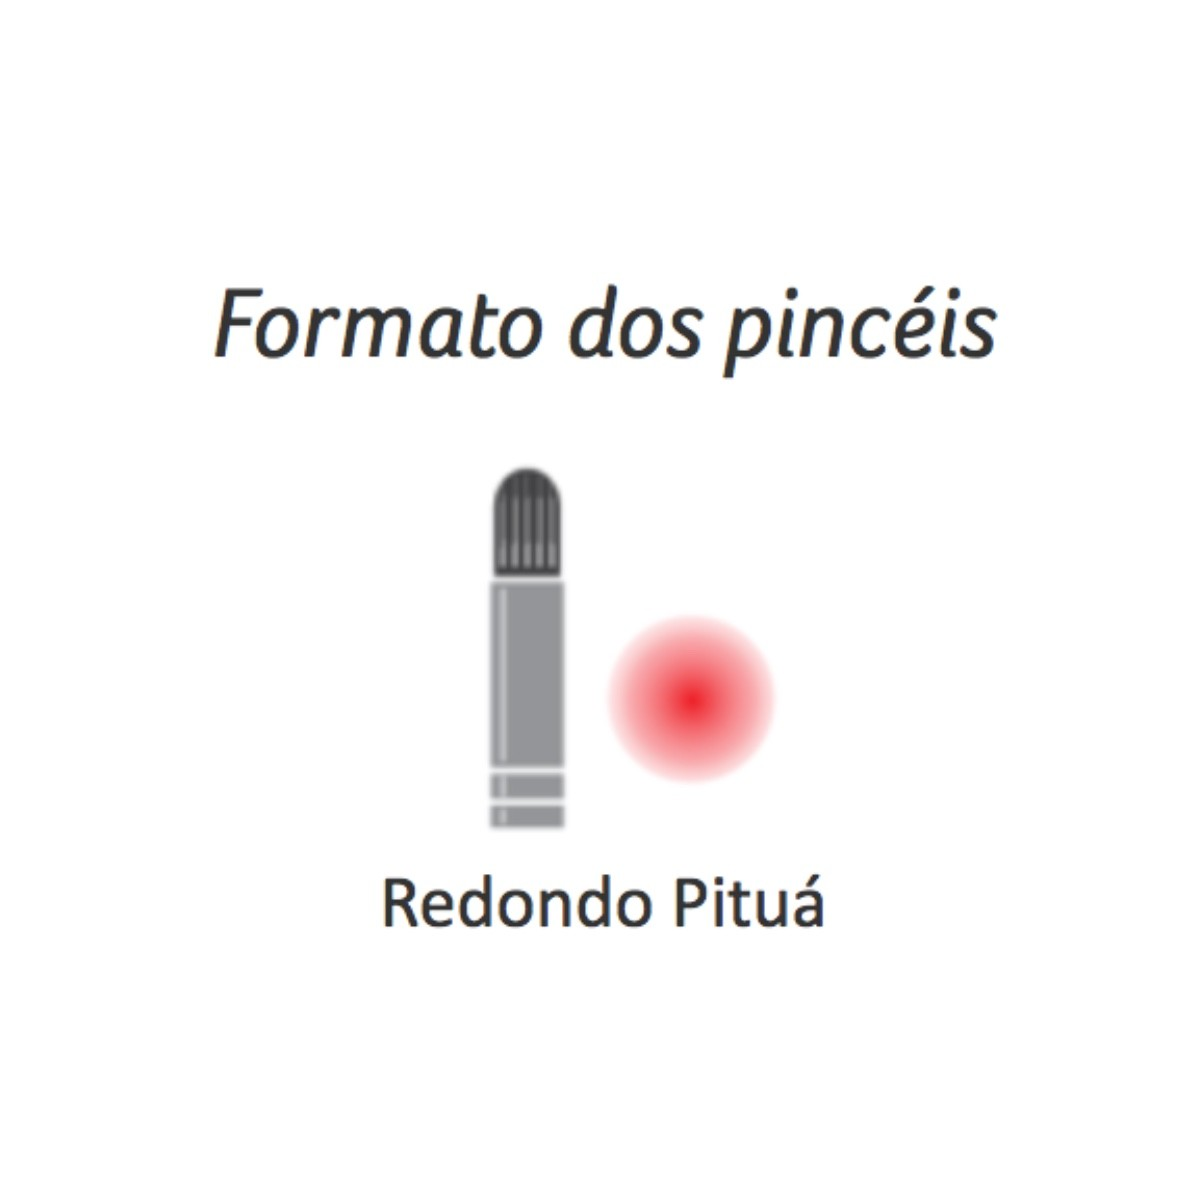 Pincel Série 423 Redondo Pituá Condor 0